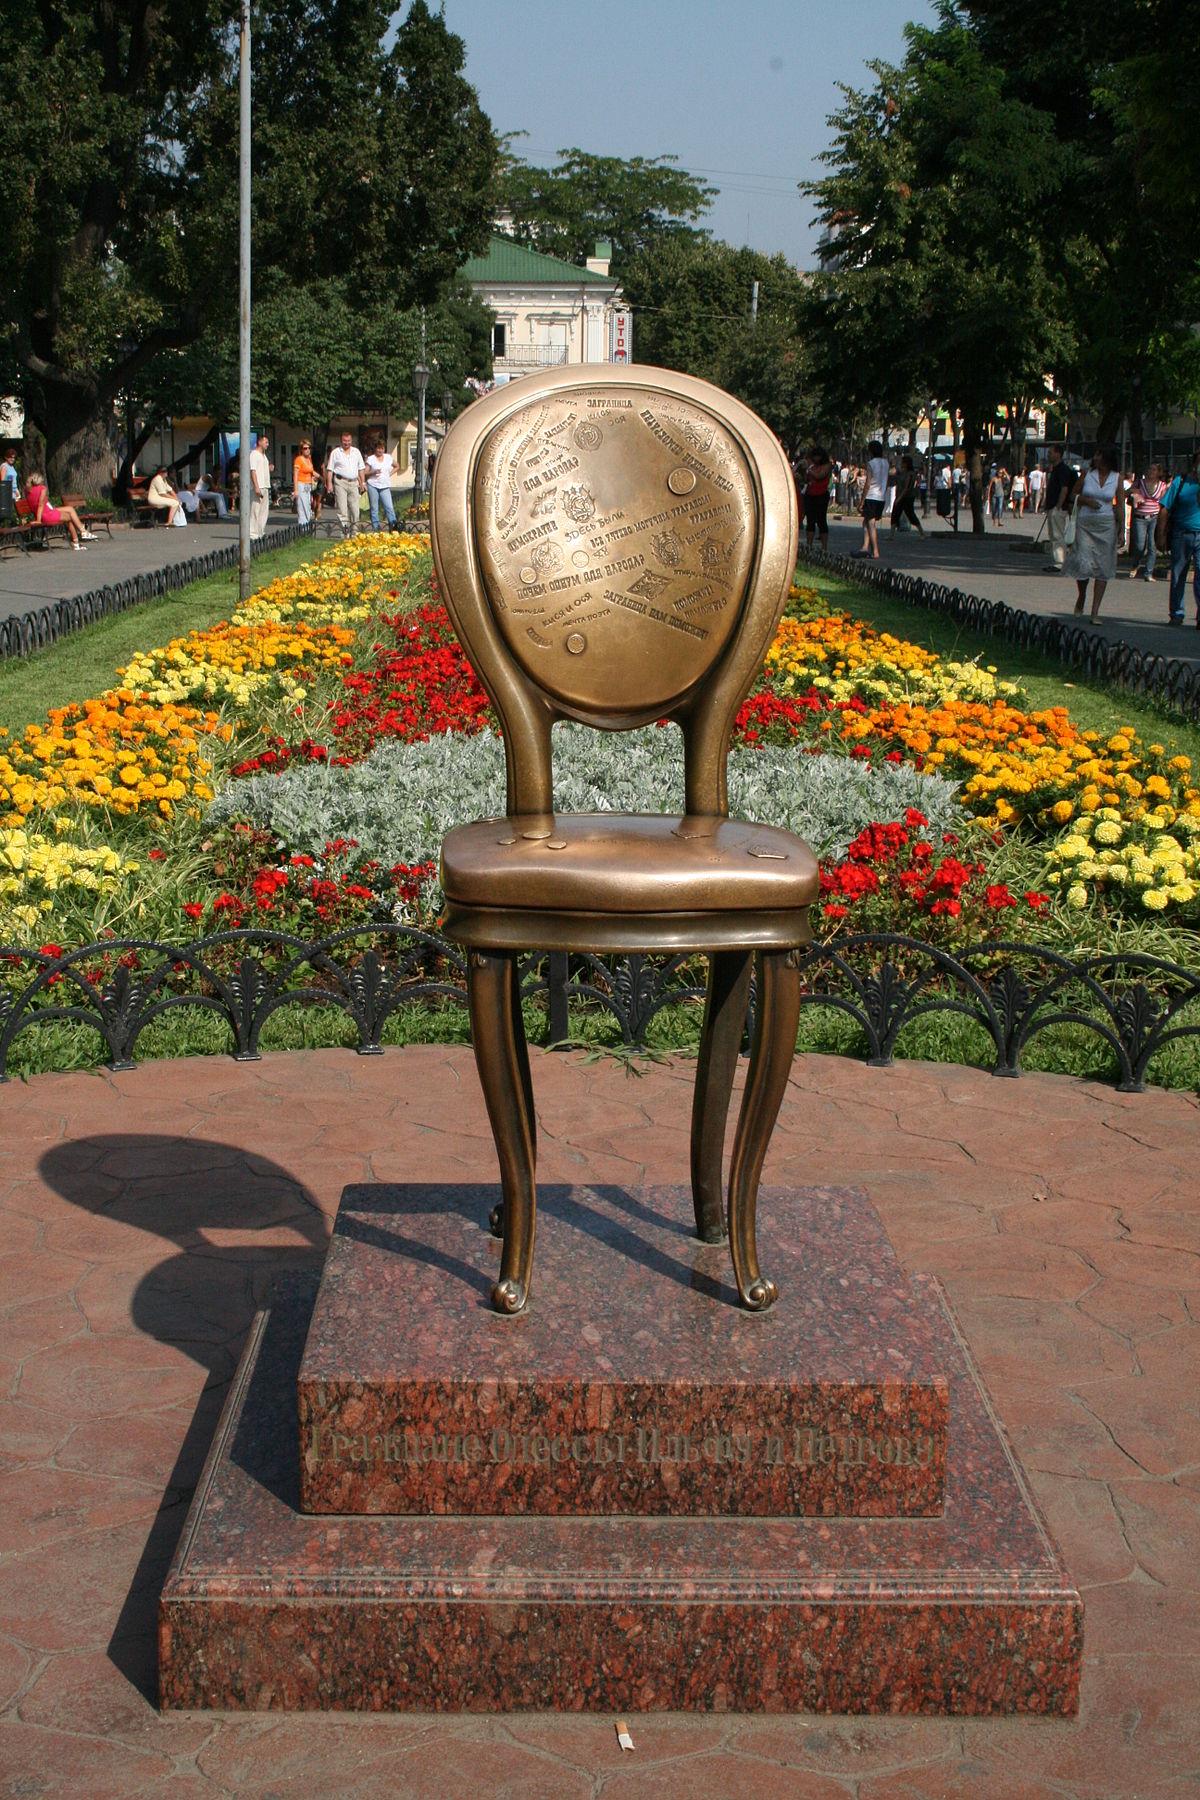 Файл:The Twelve Chairs monument in Odessa (Ukraine).jpg — Википедия